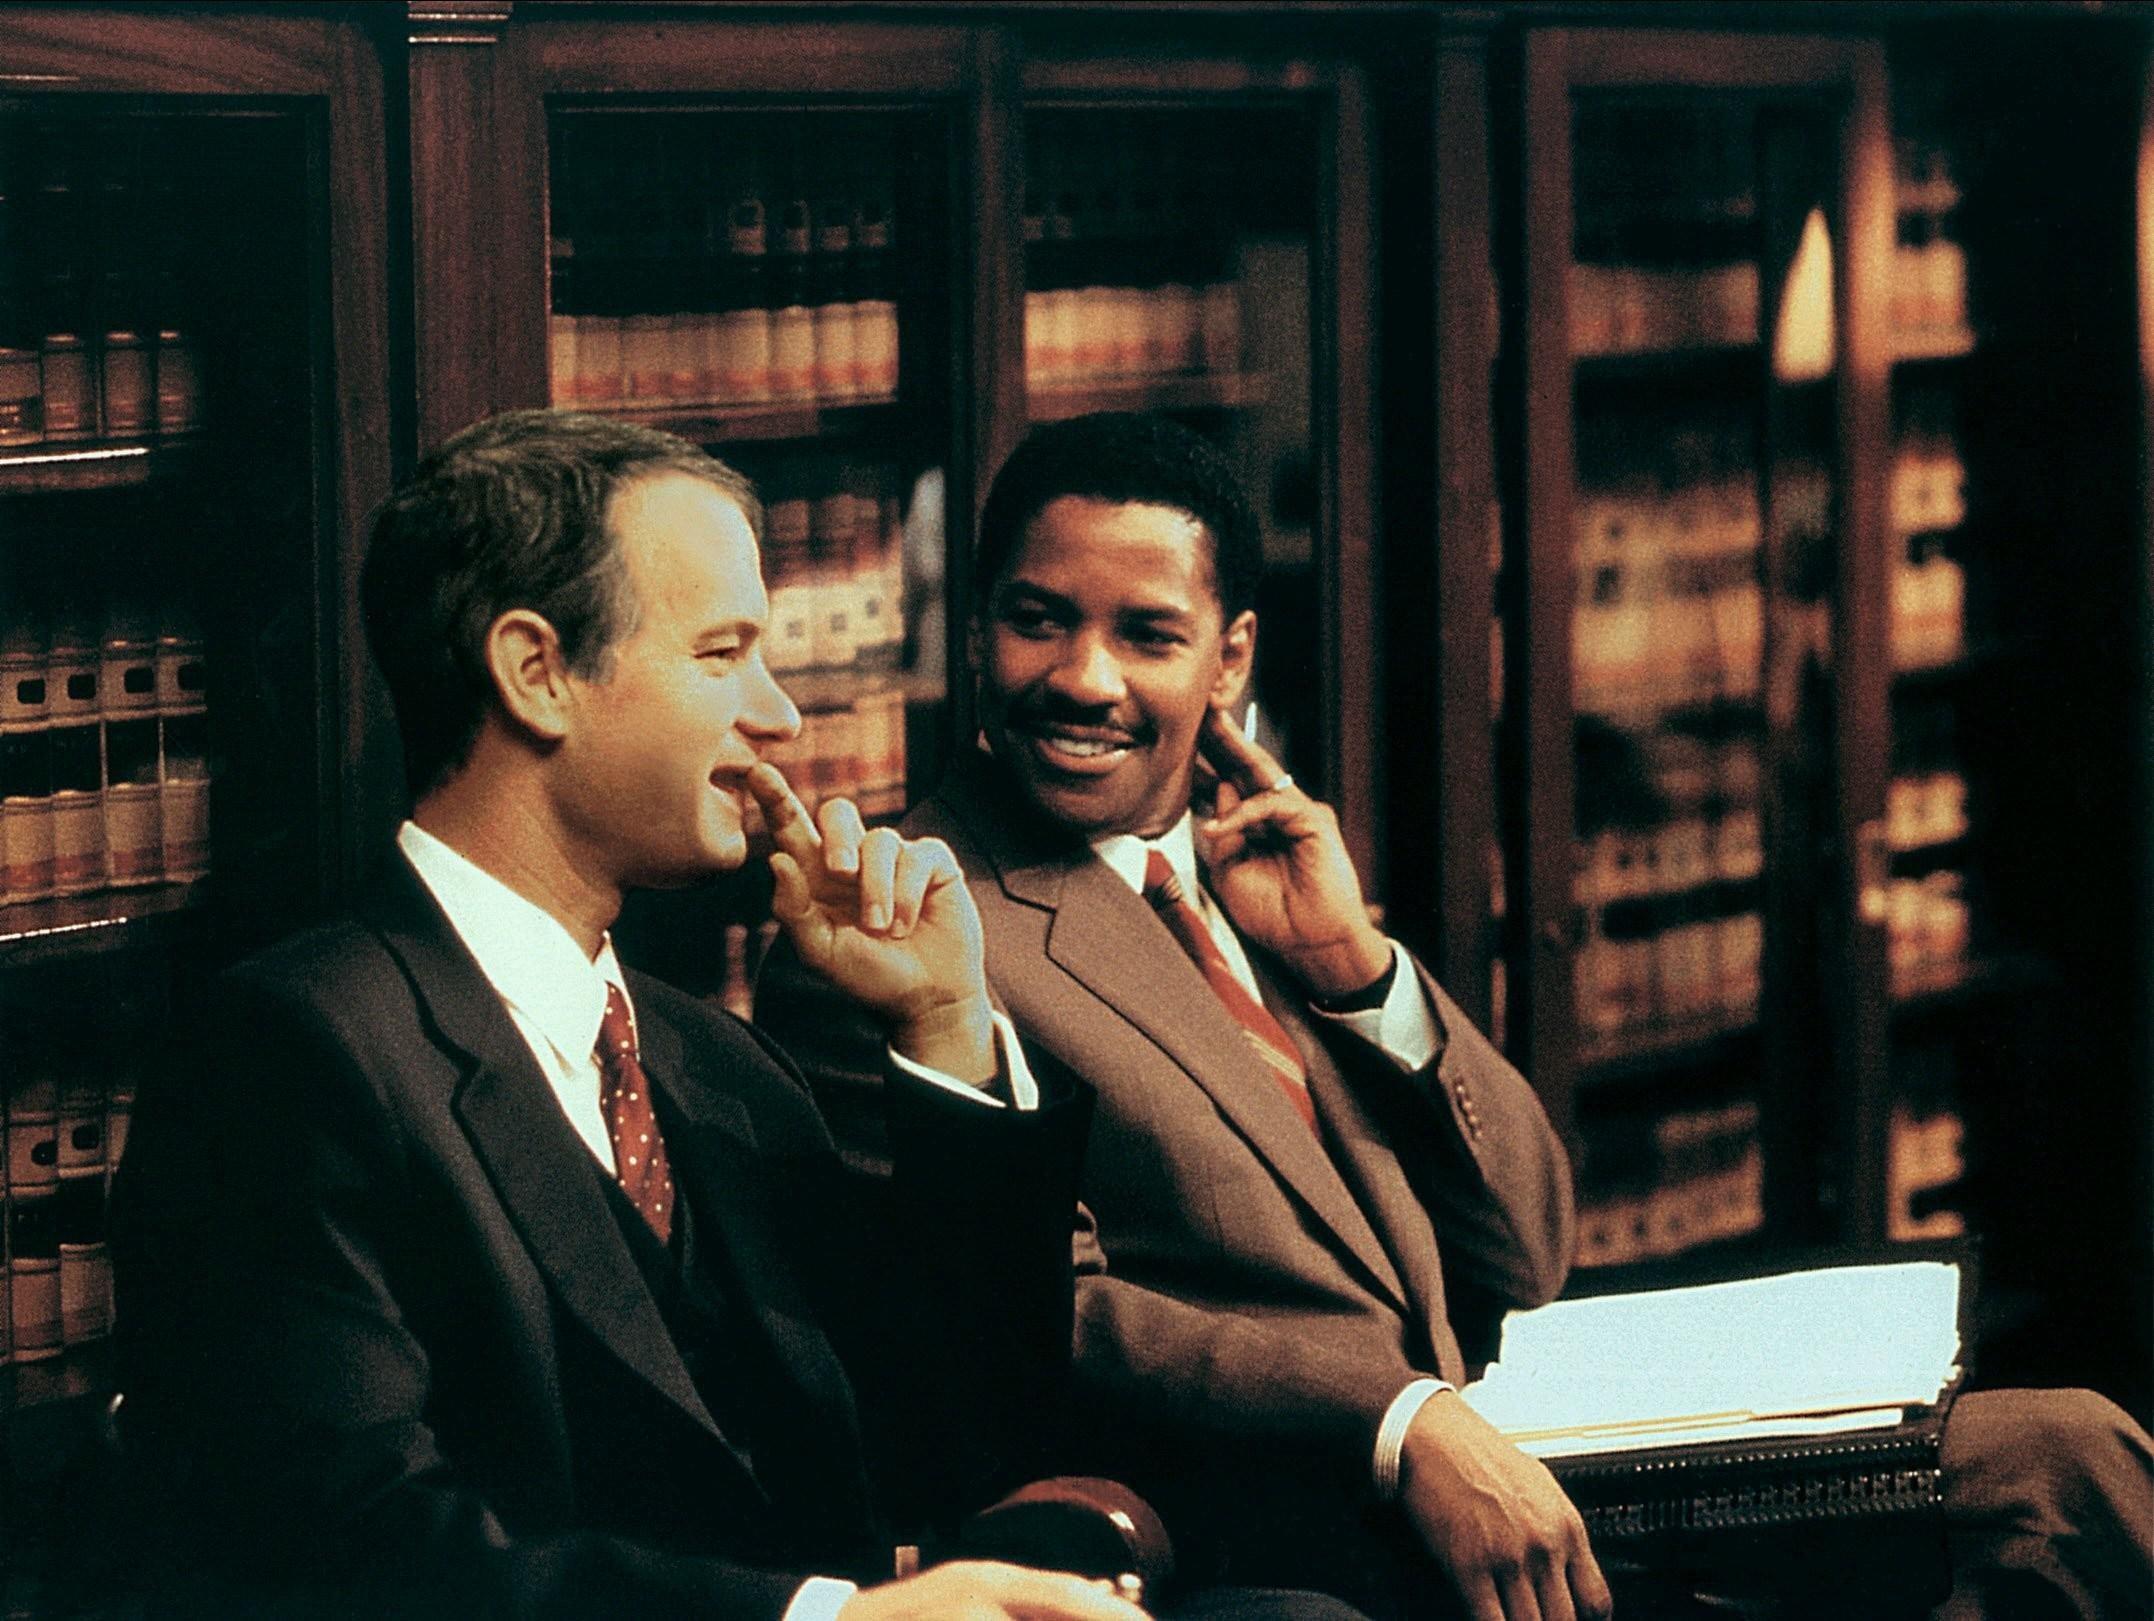 Tom Hanks and Denzel Washington's characters sit together